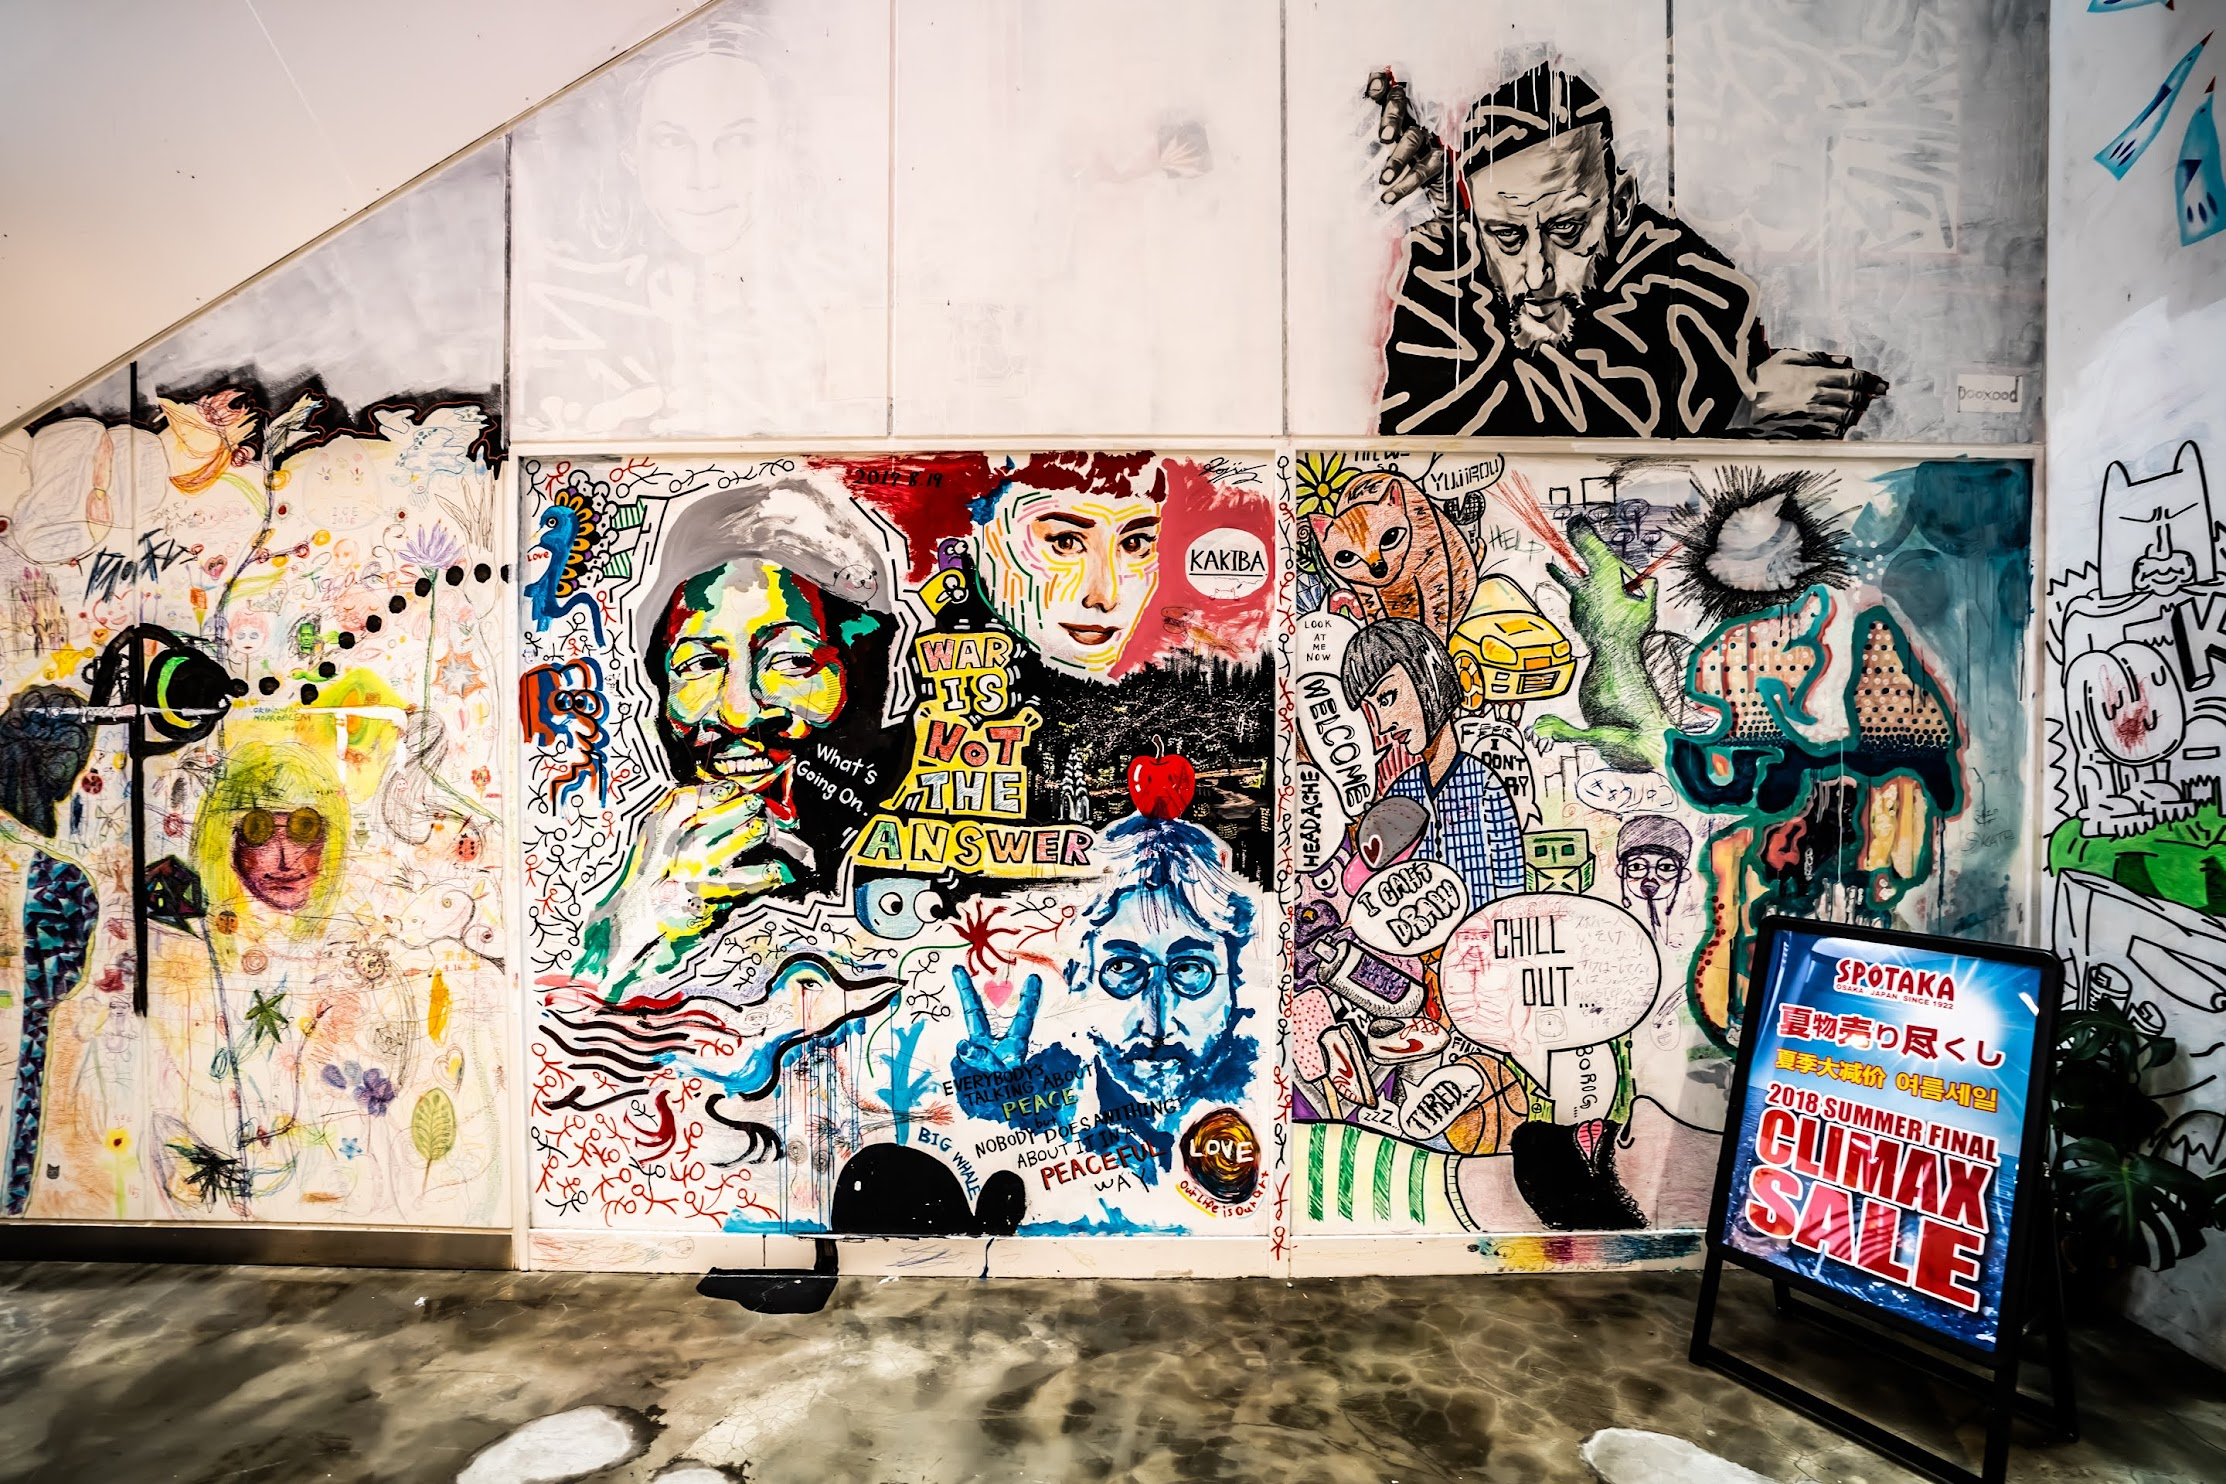 America-mura (American Village) wall art